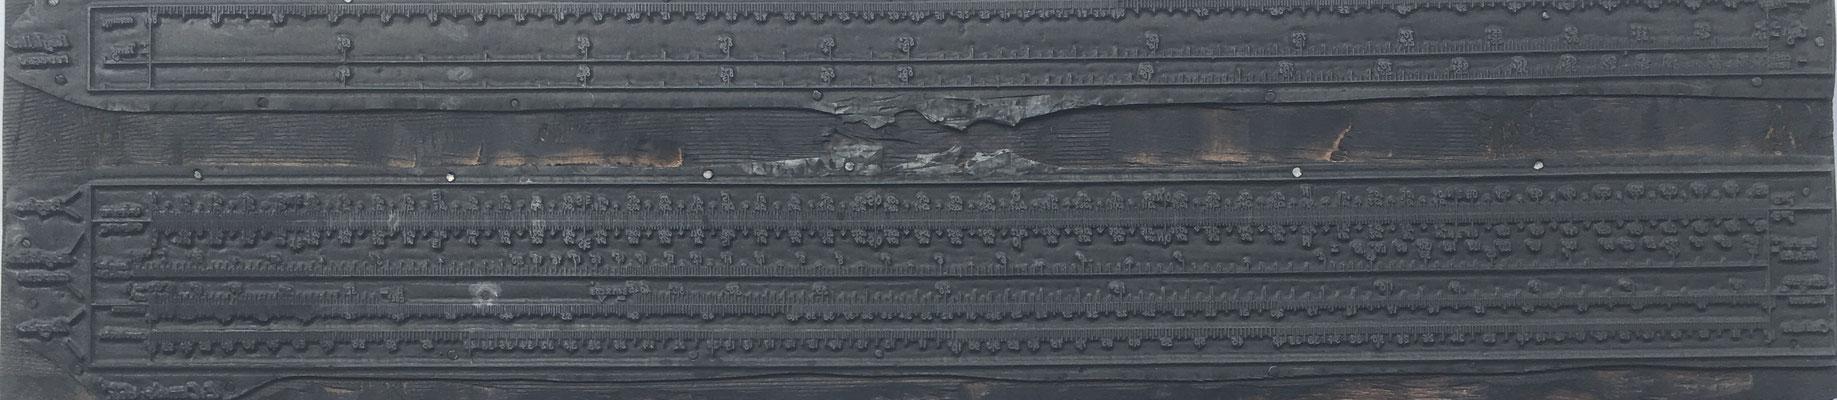 Cliché (matriz o plancha) de metal sobre base de madera para máquina plana de la Regla E. CONDE (modelo 1), 45x10.5 cm